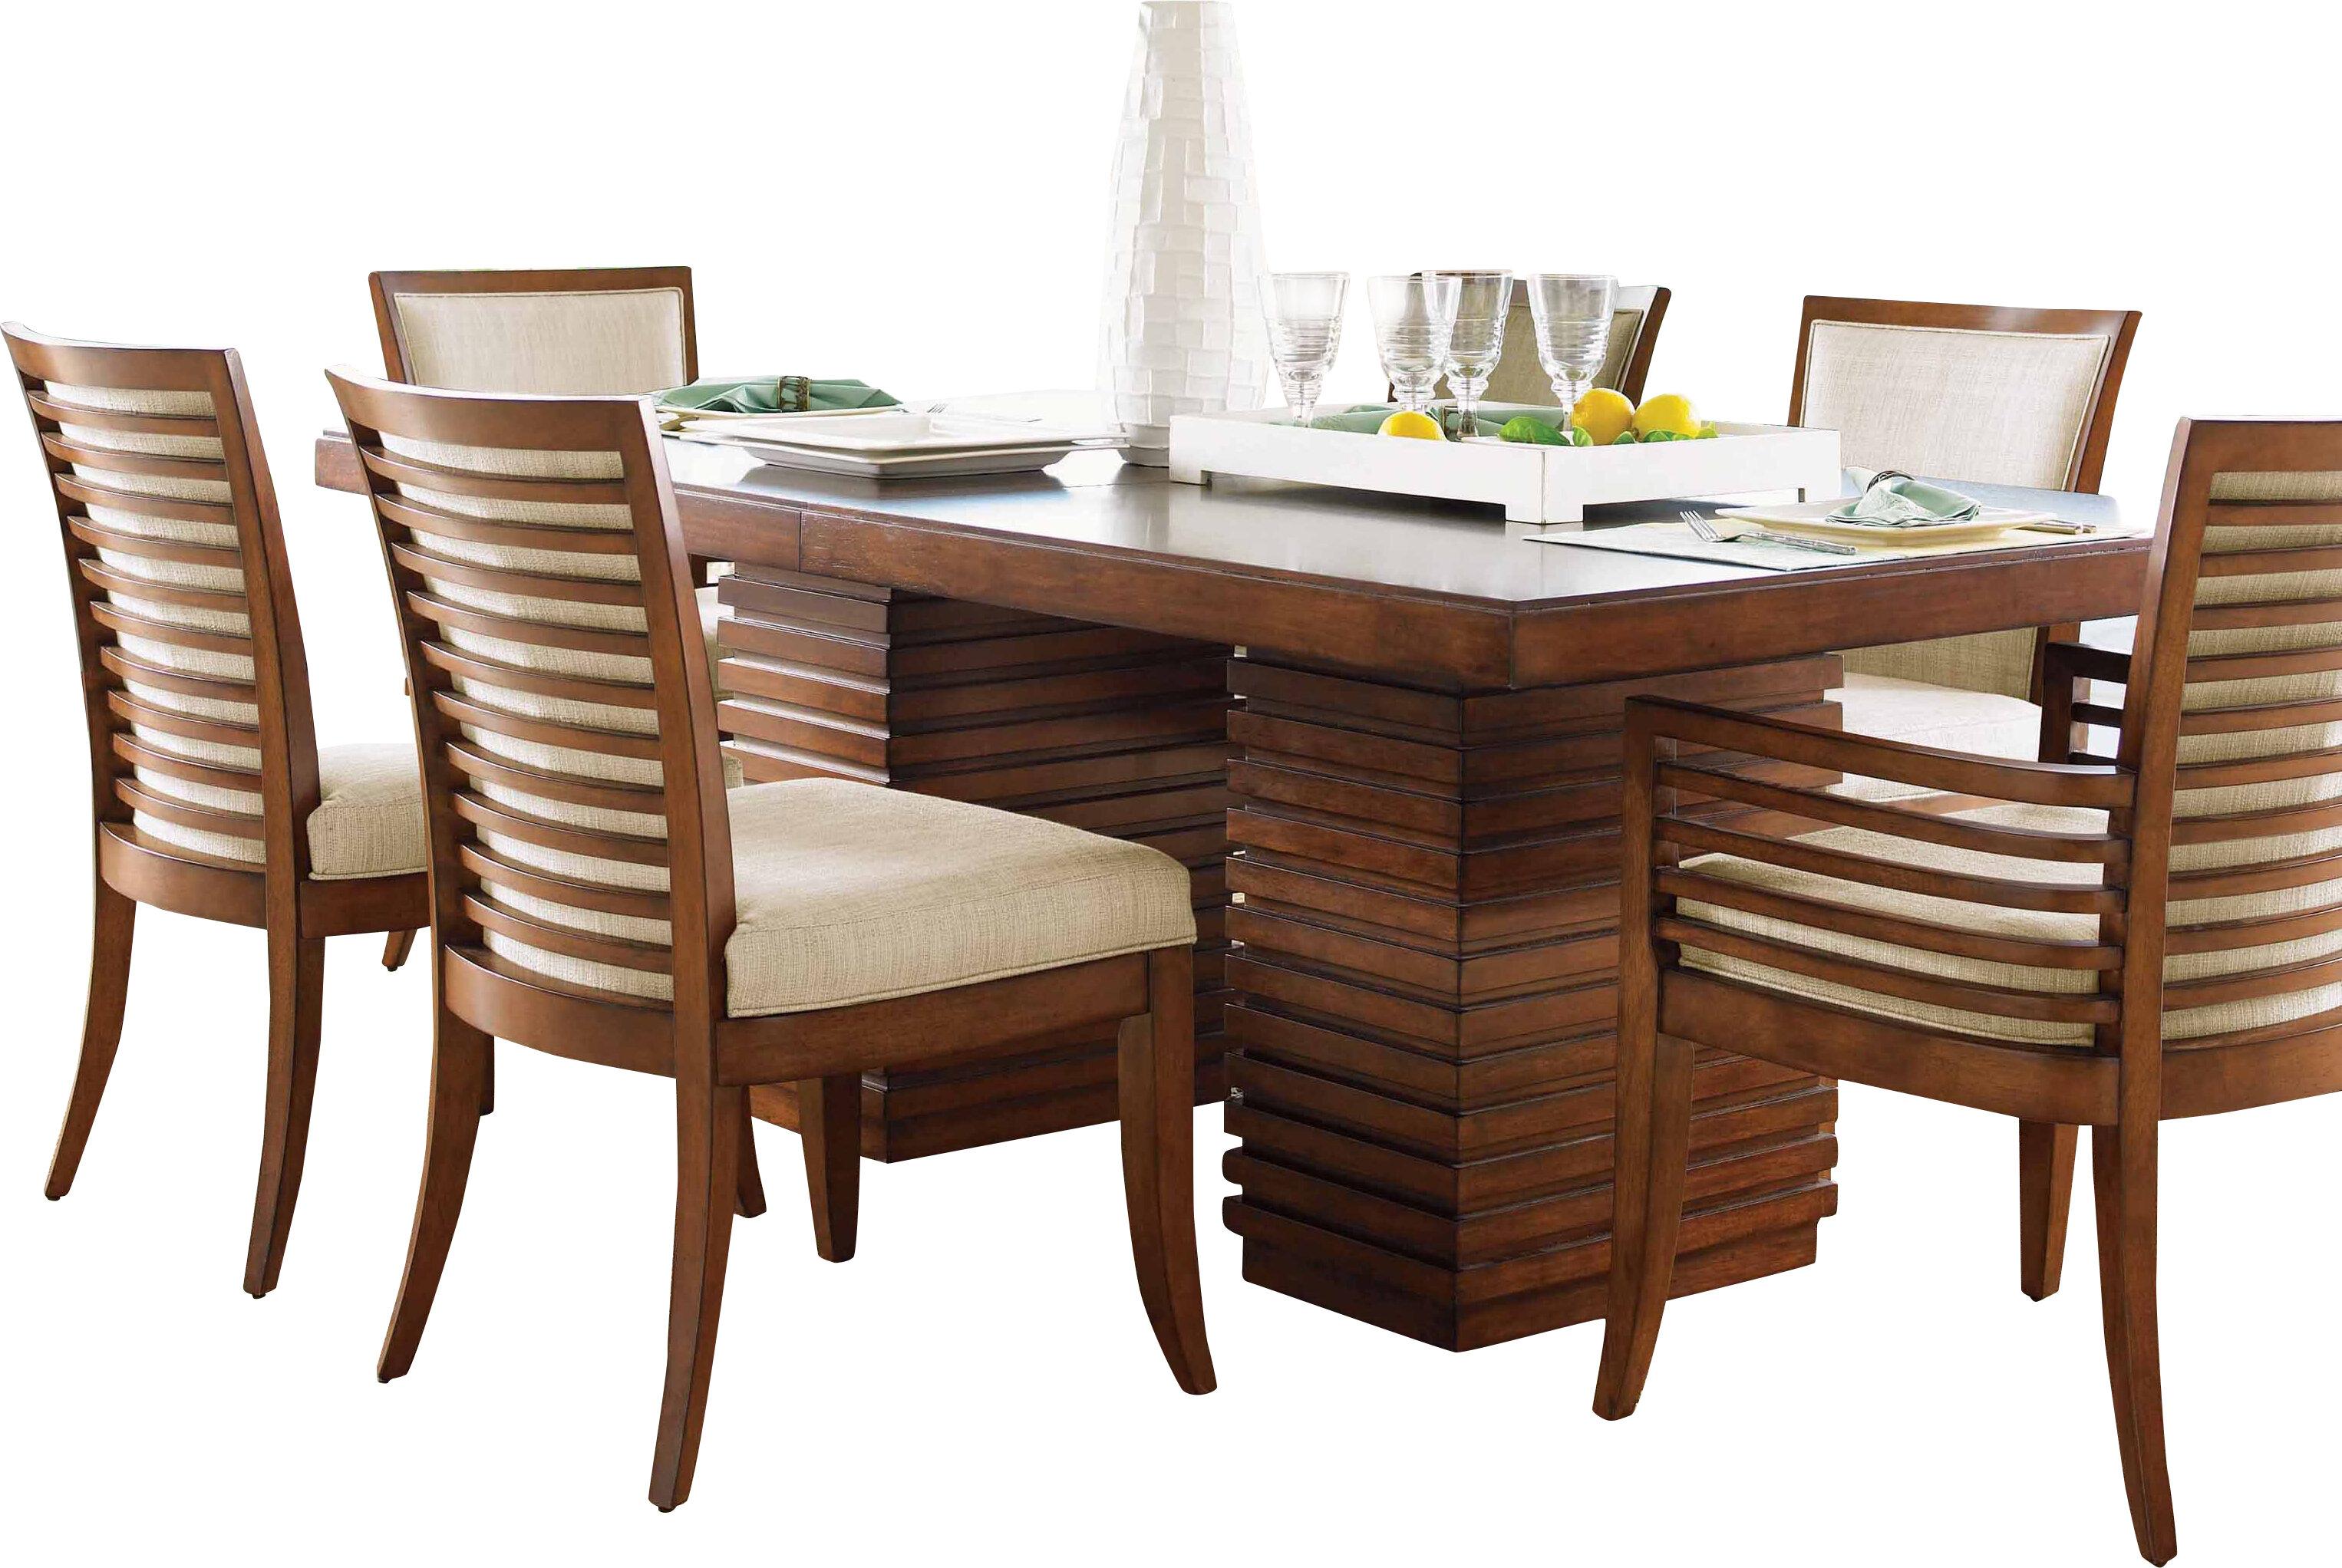 Tommy Bahama Home Ocean Club Peninsula Dining Table | Wayfair